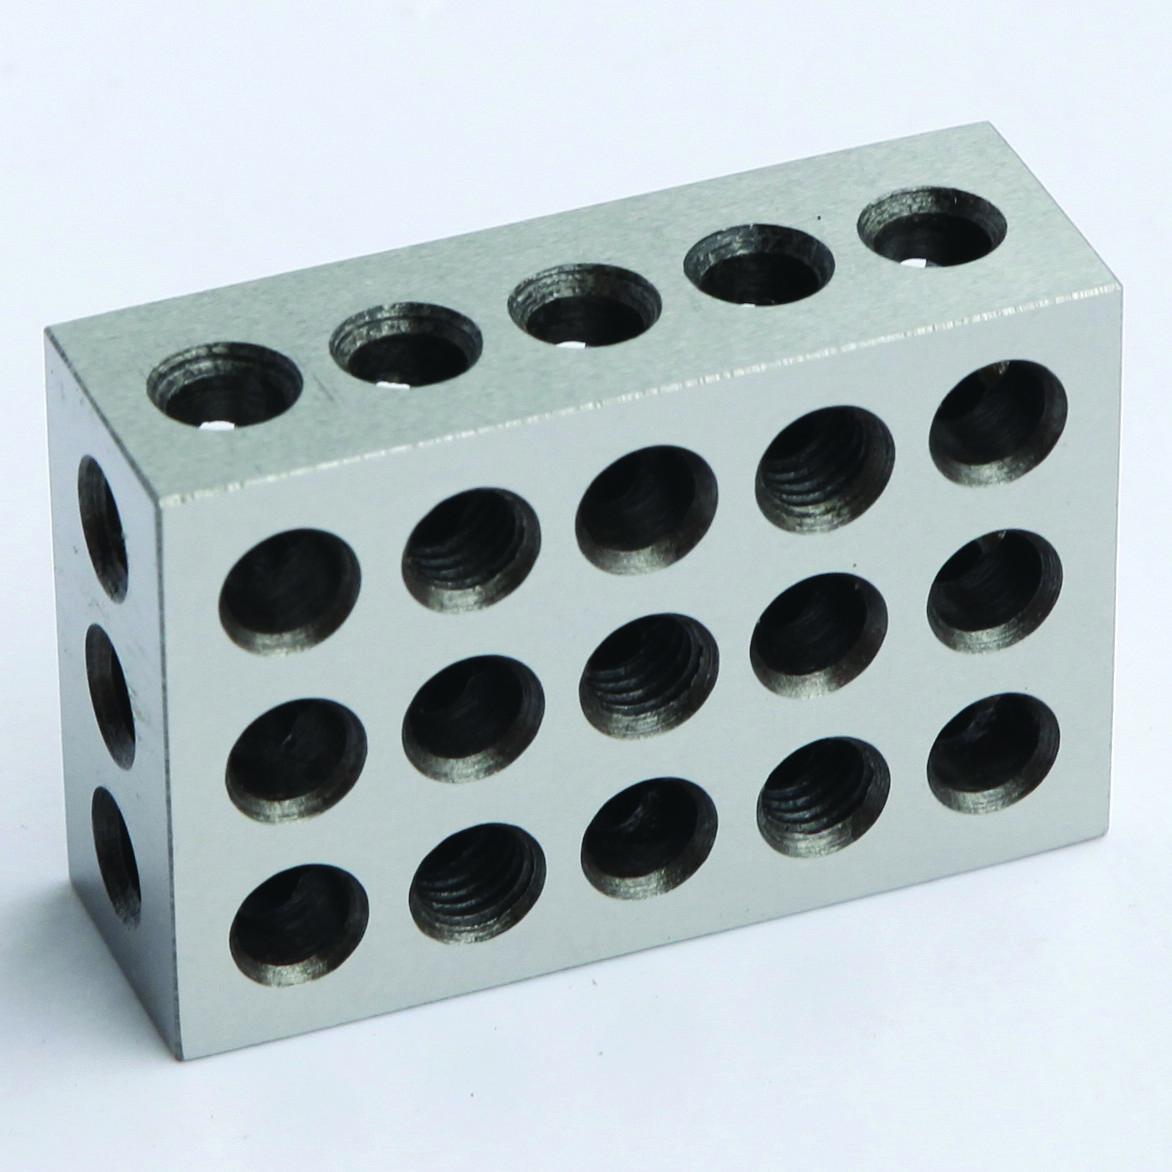 Купить HFS BLOCK123-LS-1x2 - HFS 1 PAIR 123 BLOCKS 1-2-3 ULTRA PRECISION .0002 HARDENED 23 HOLES 0.0002